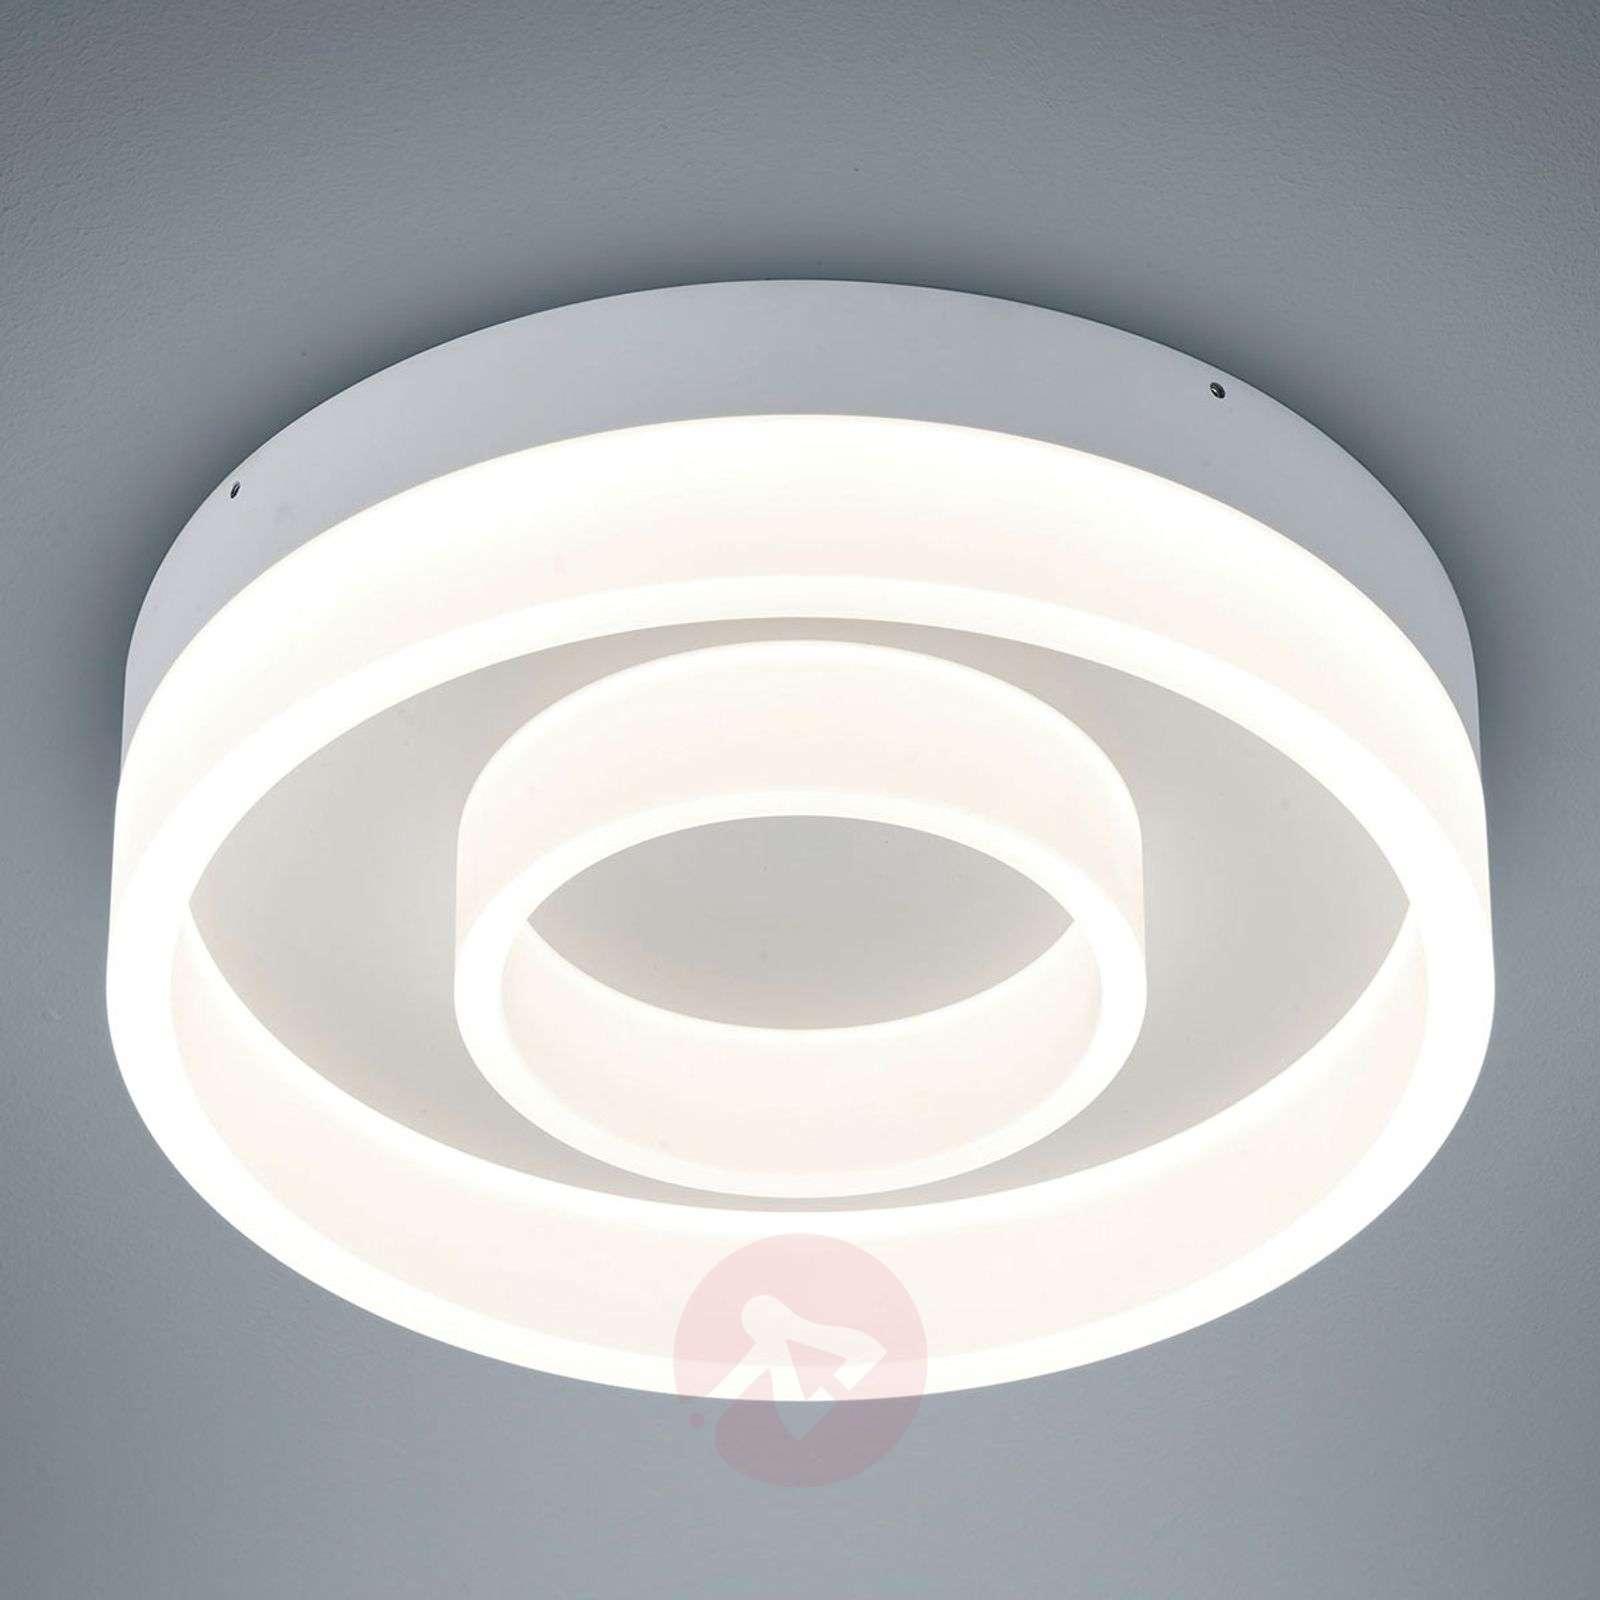 Helestra Liv pyöreä LED-kattolamppu 30 cm-4516982-01